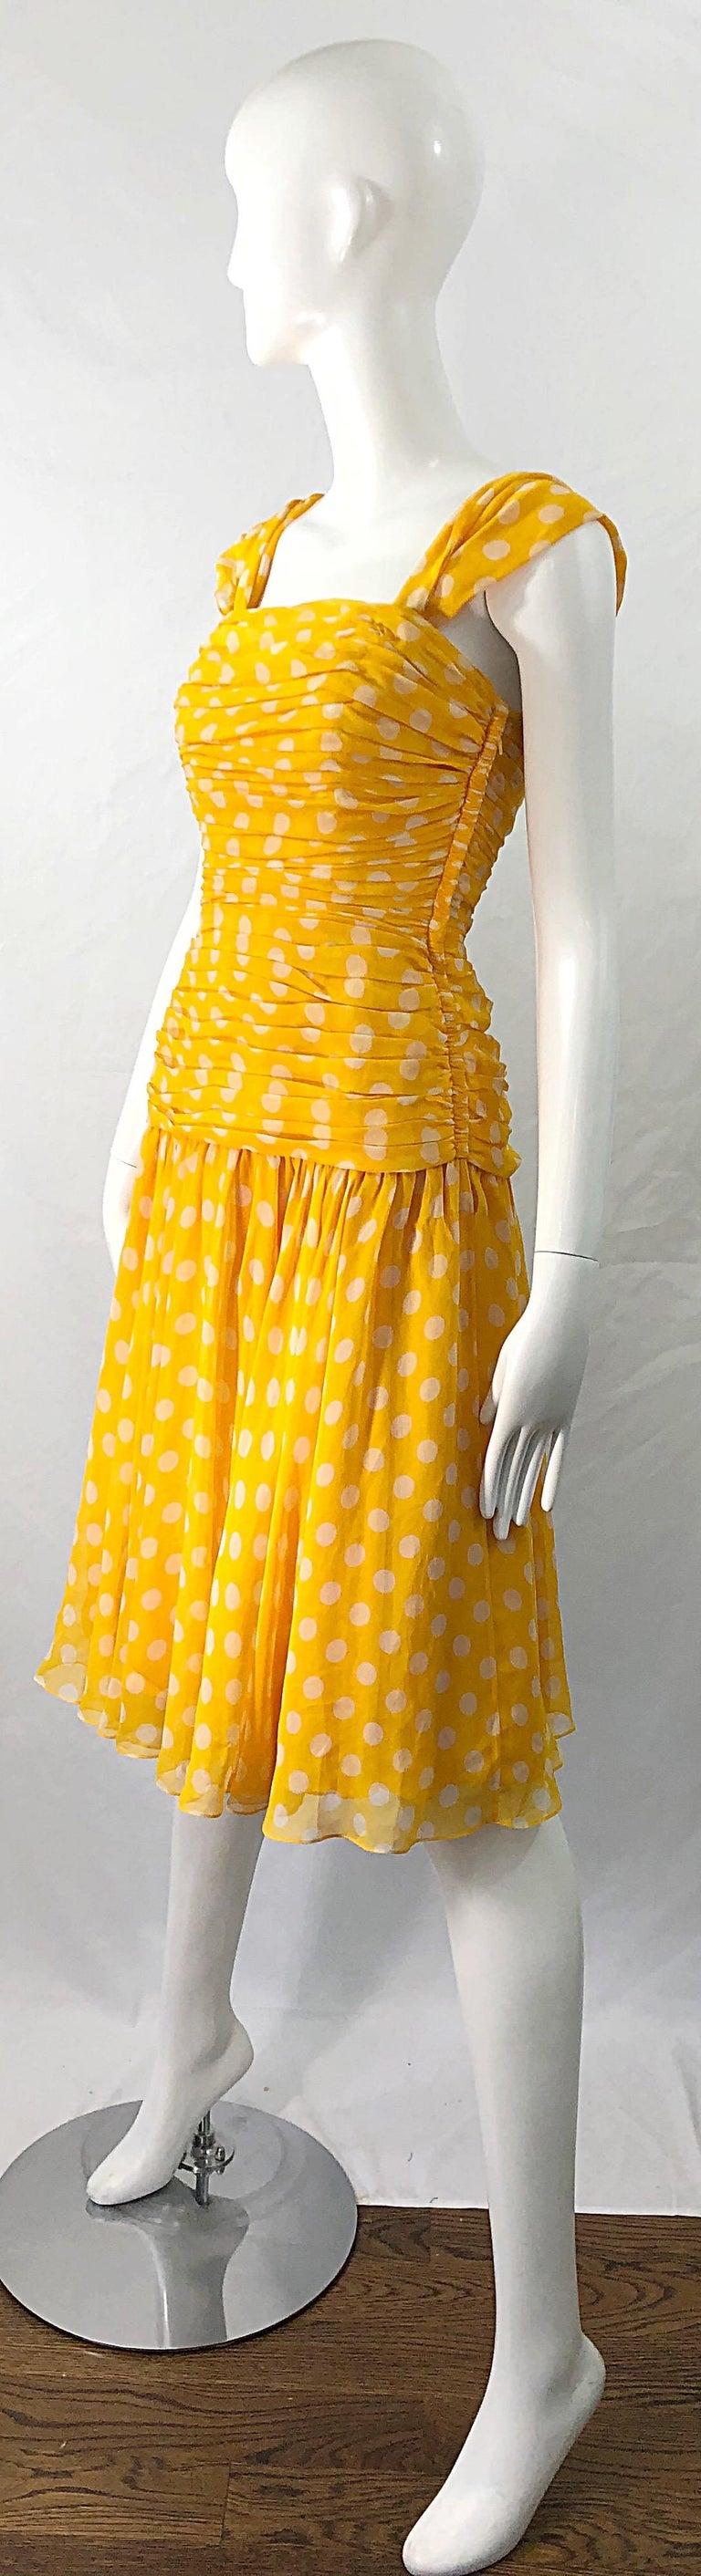 Adele Simpson 1980s Size 4 Yellow White Silk Chiffon Polka Dot Vintage 80s Dress For Sale 1